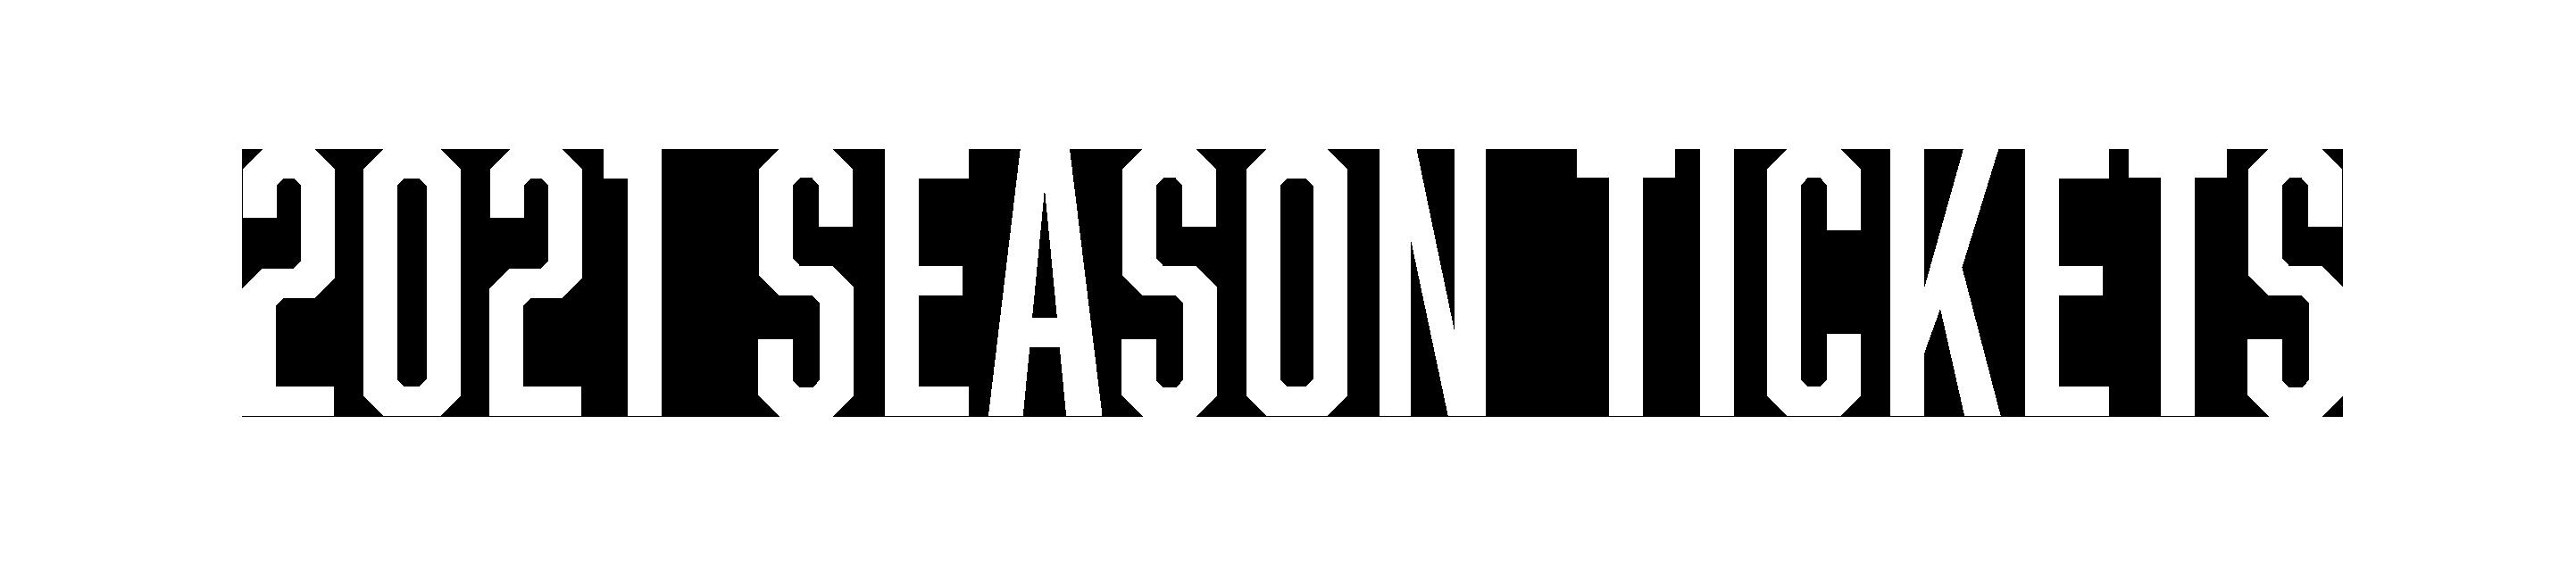 2021 Season Tickets Header